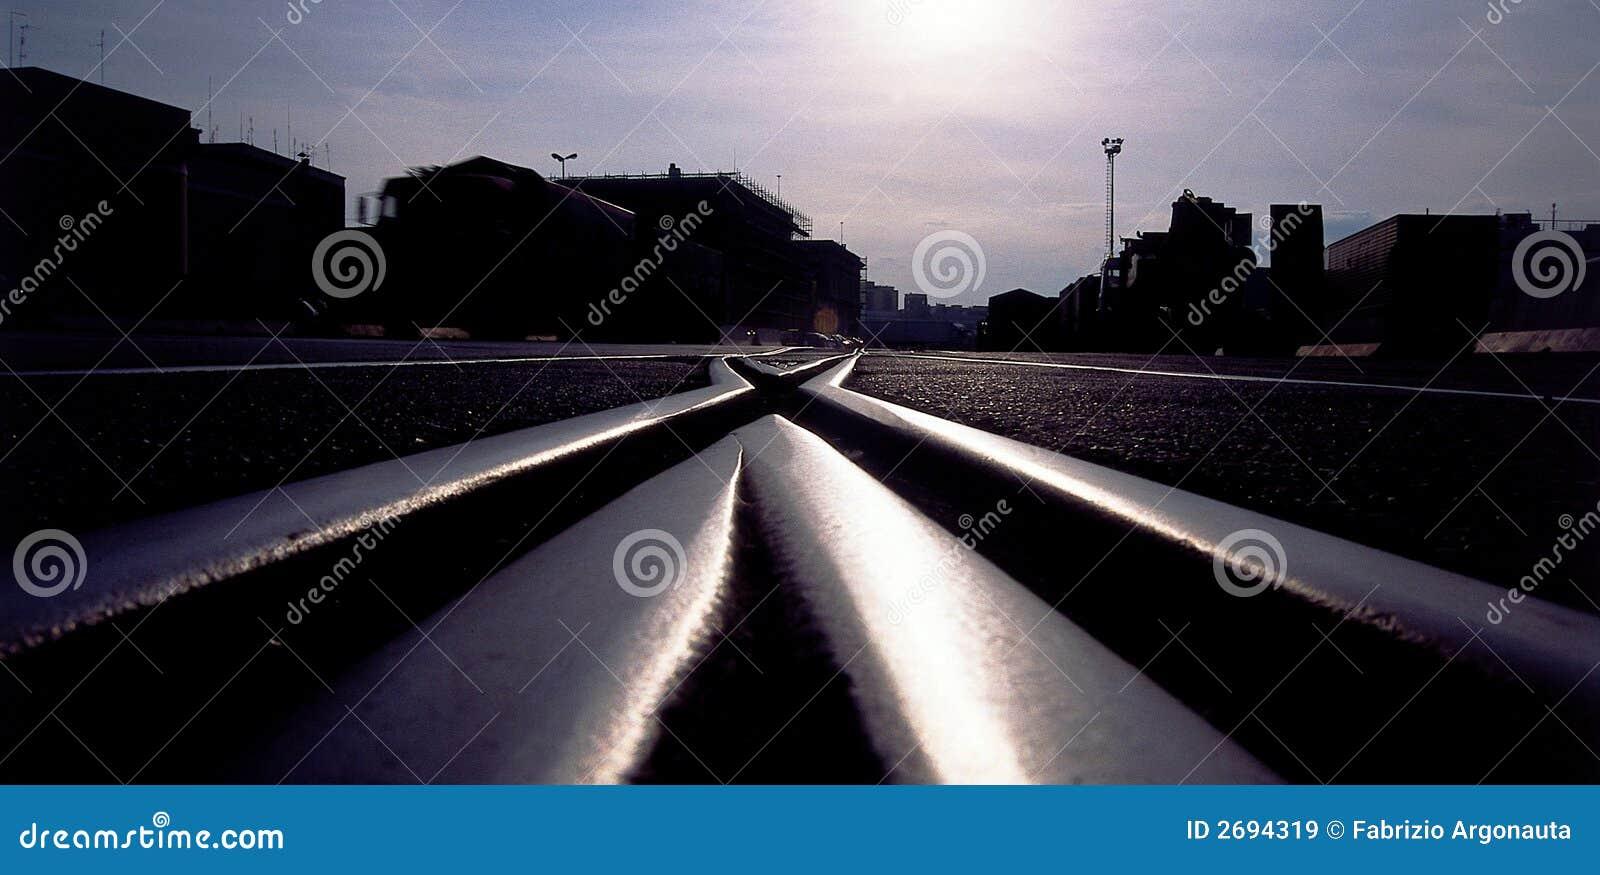 Jonction de chemin de fer